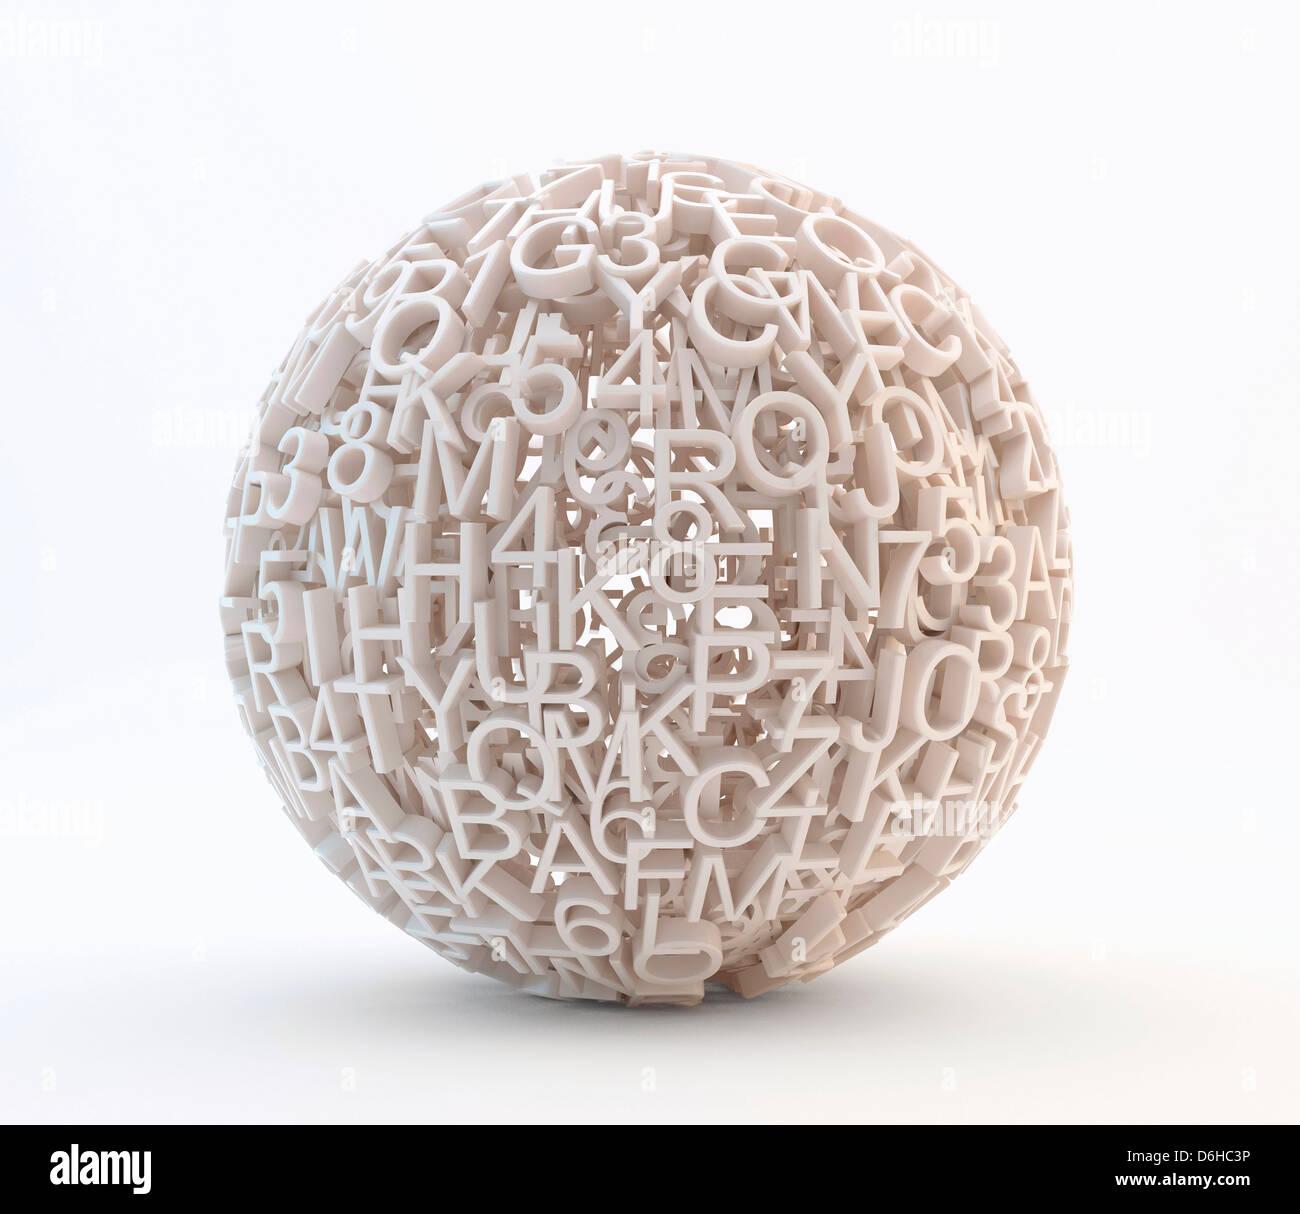 Globale Daten, konzeptuellen Kunstwerk Stockbild